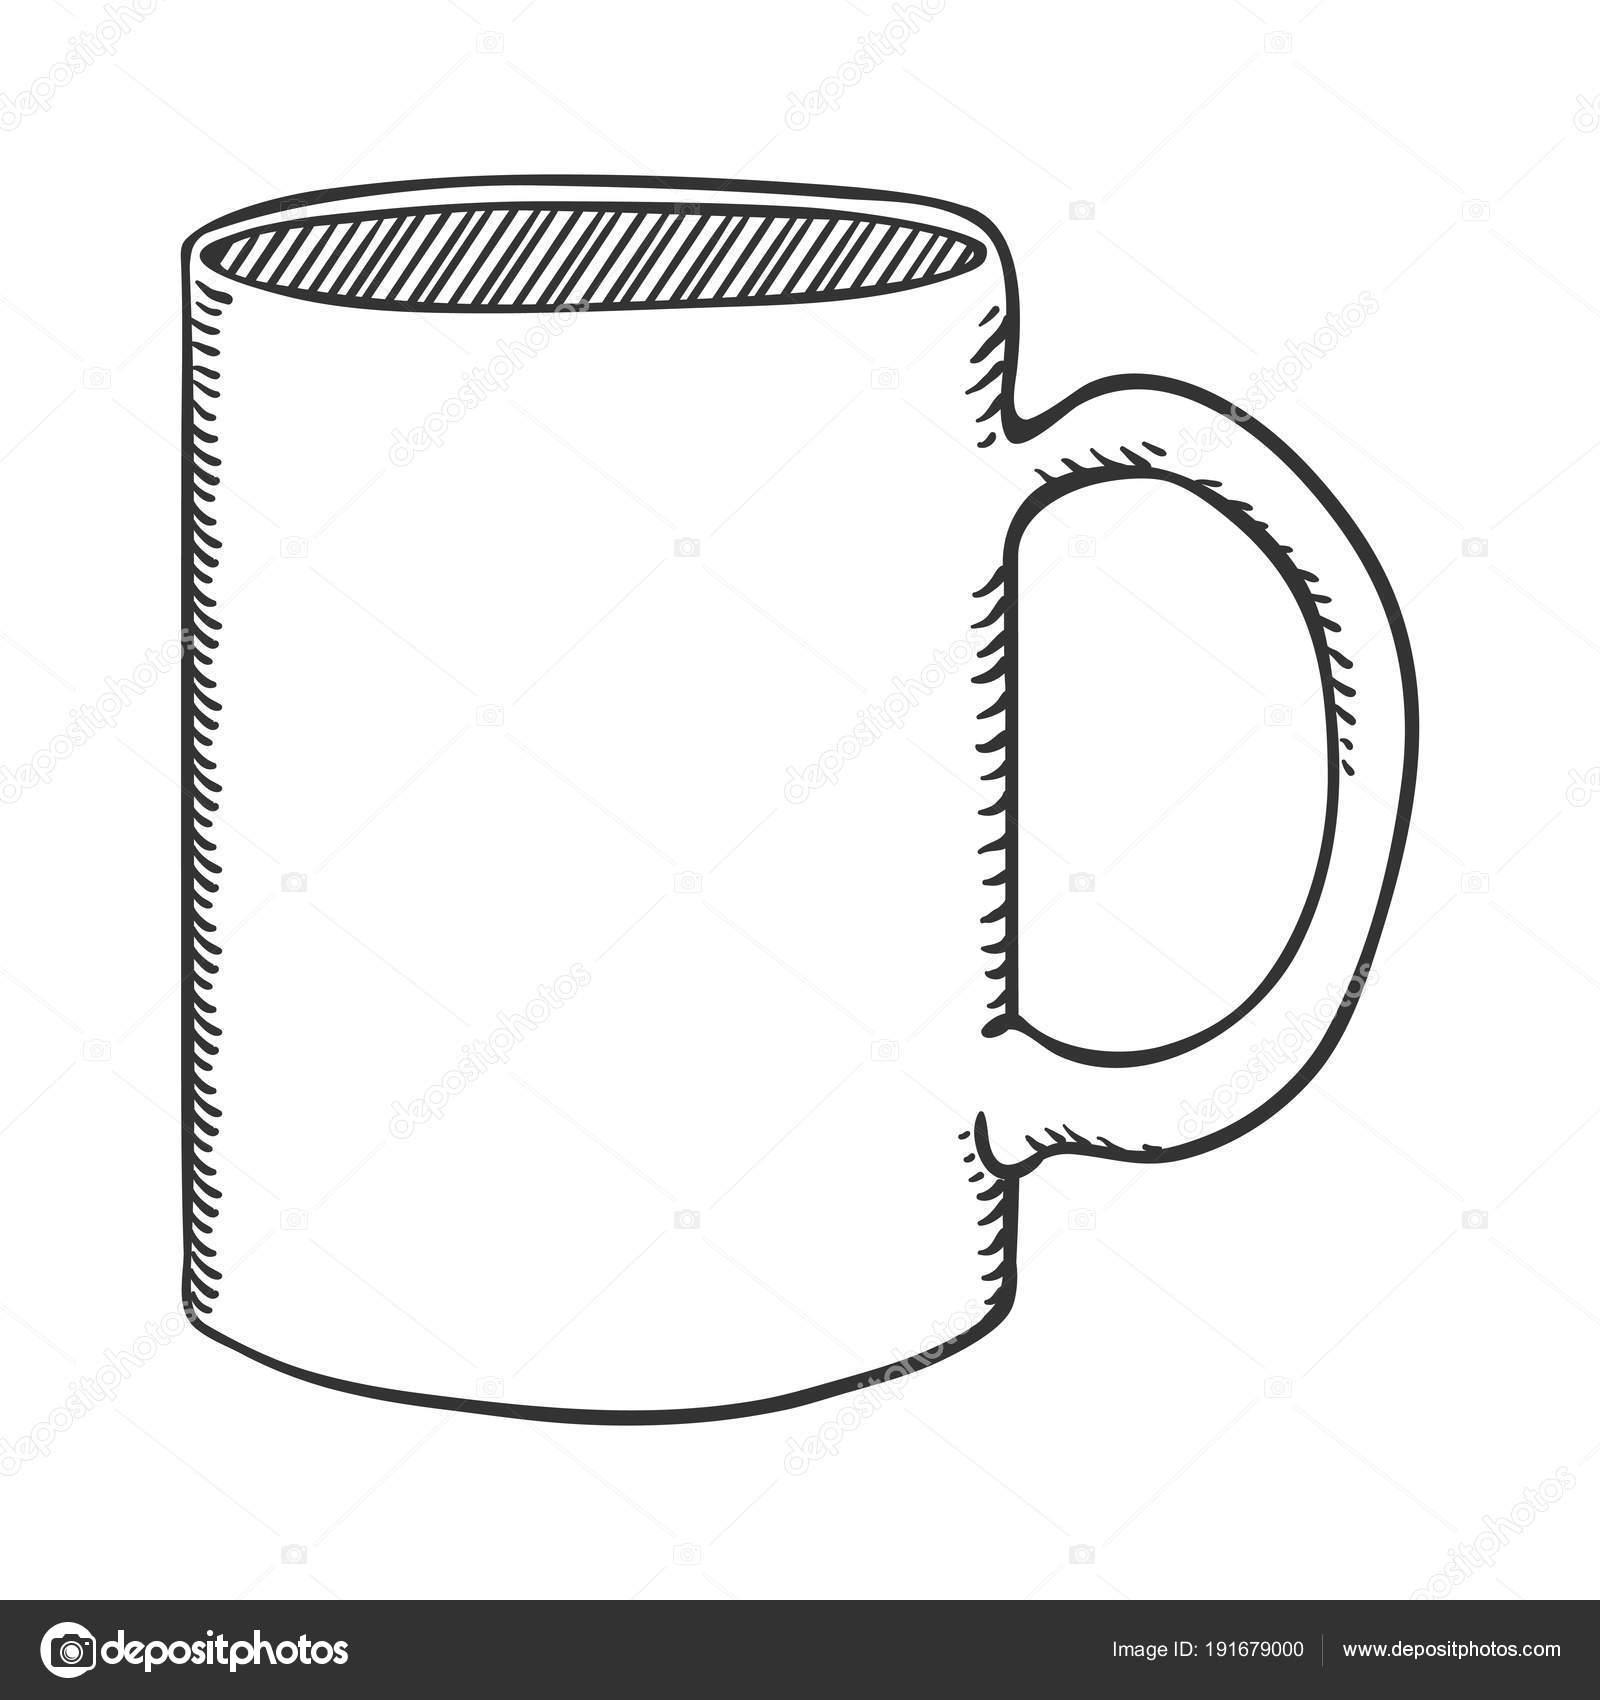 Images Mug Outline Vector Outline Sketch Illustration Classic Tea Mug Stock Vector C Nikiteev 191679000